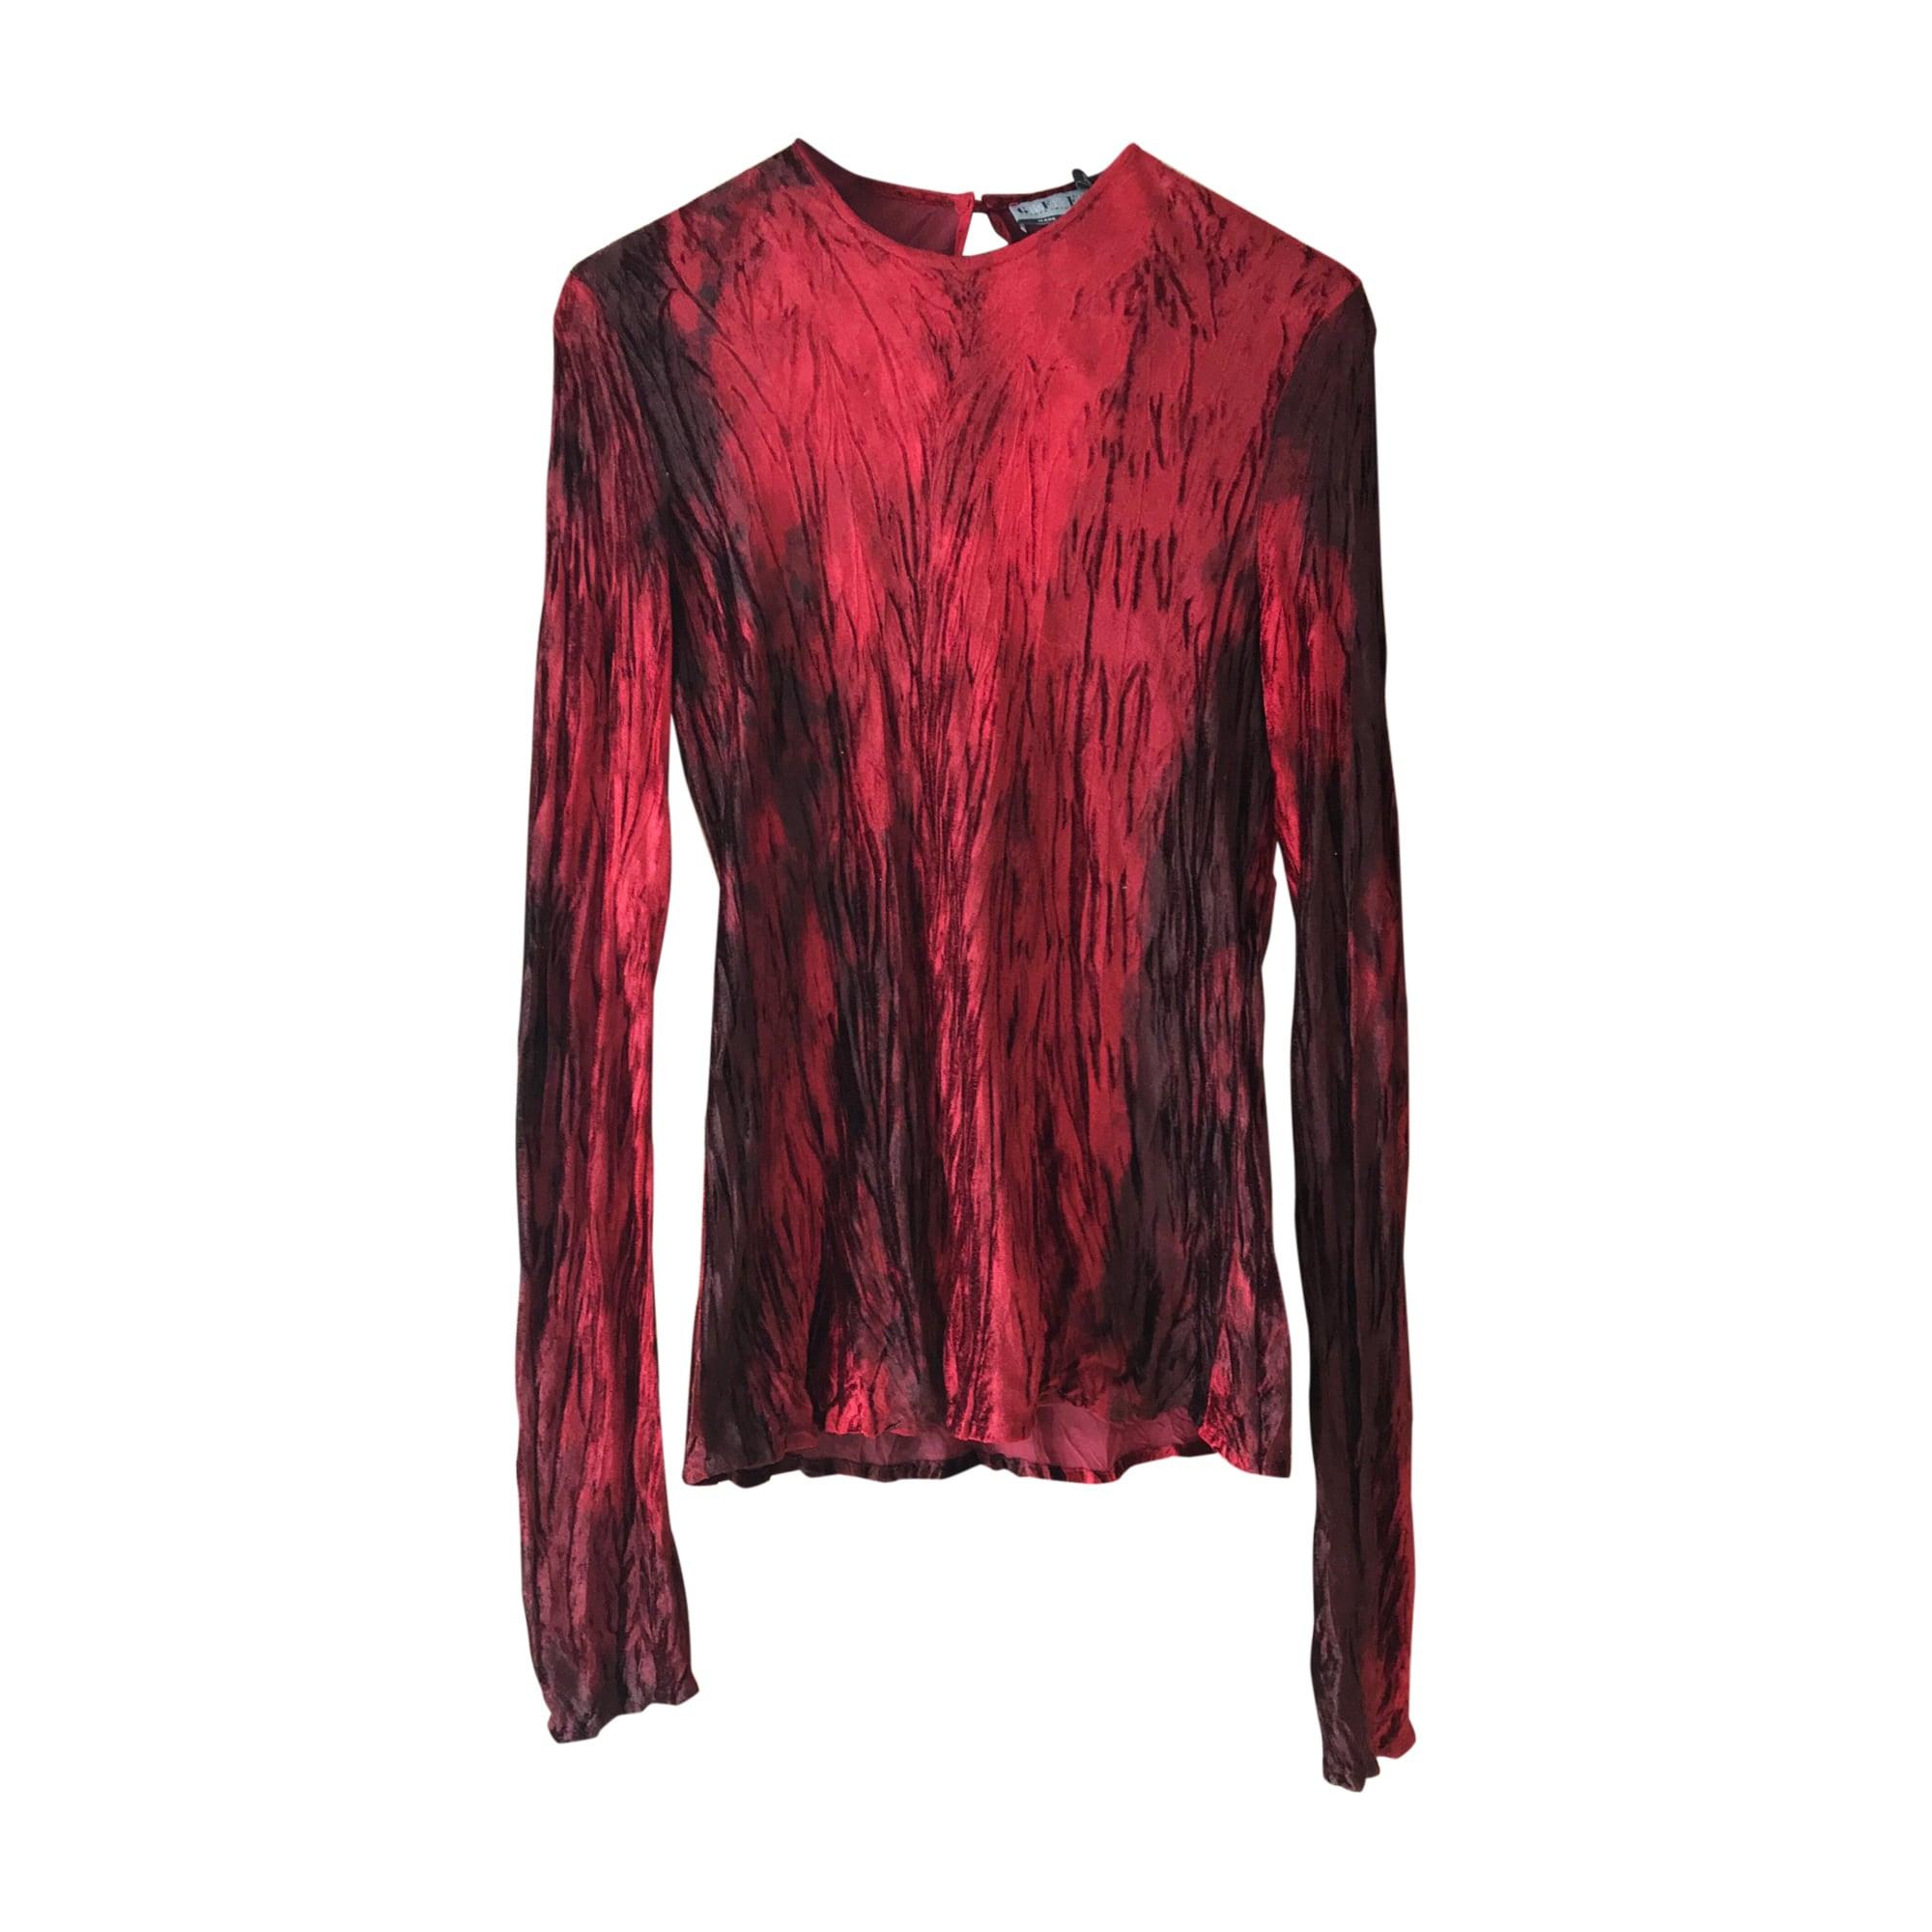 Top, tee-shirt GIANFRANCO FERRE Rouge, bordeaux